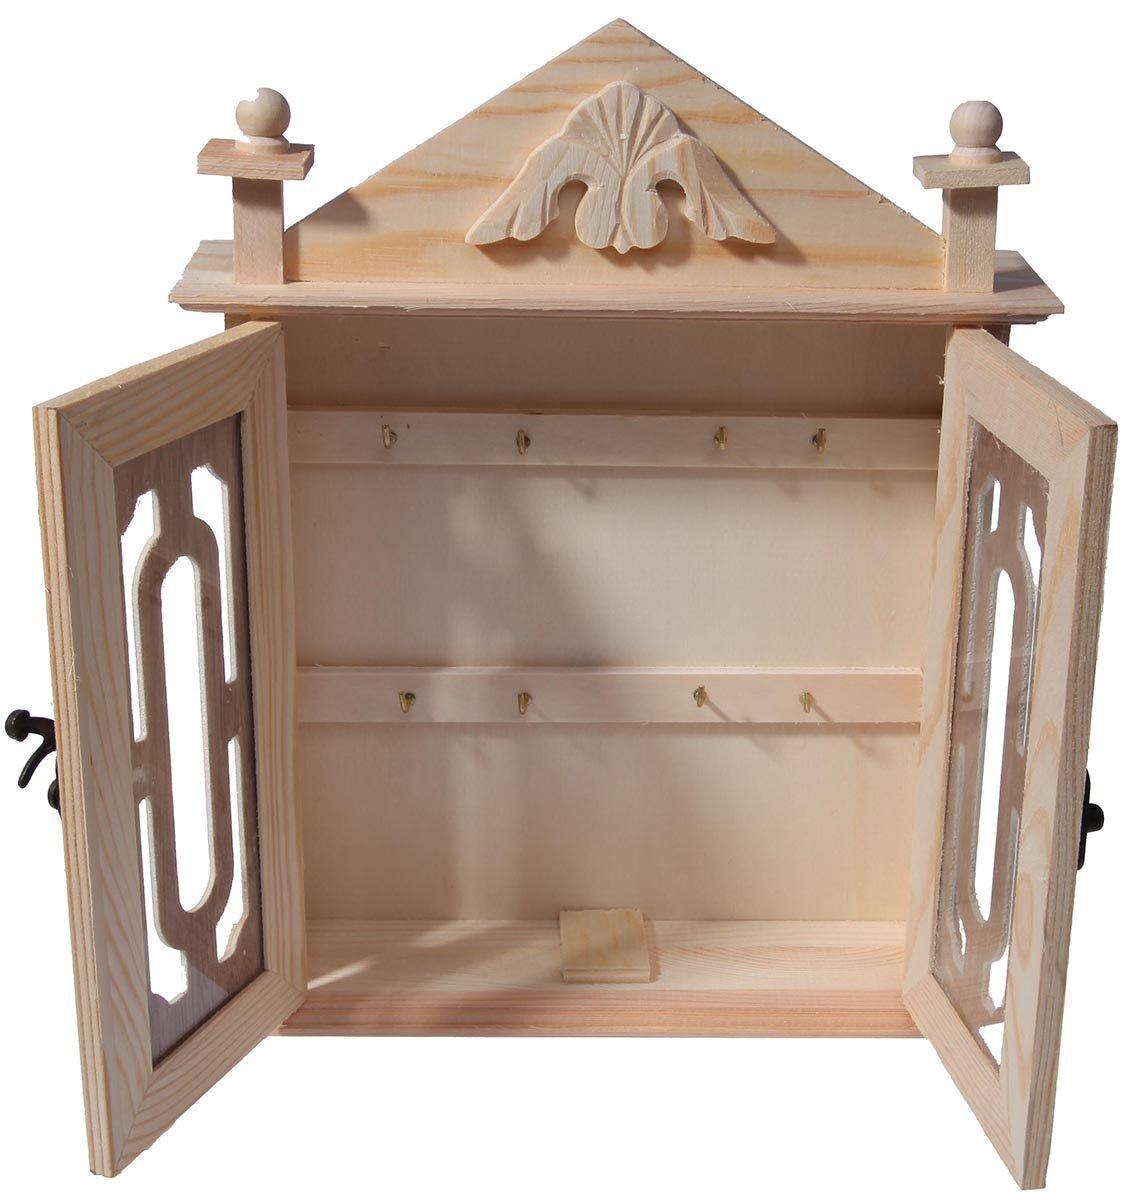 Perfect Amazon.com: Key Organizer / Key Cabinet   Natural Wood Key Storage Cabinet    11 Inches: Home U0026 Kitchen